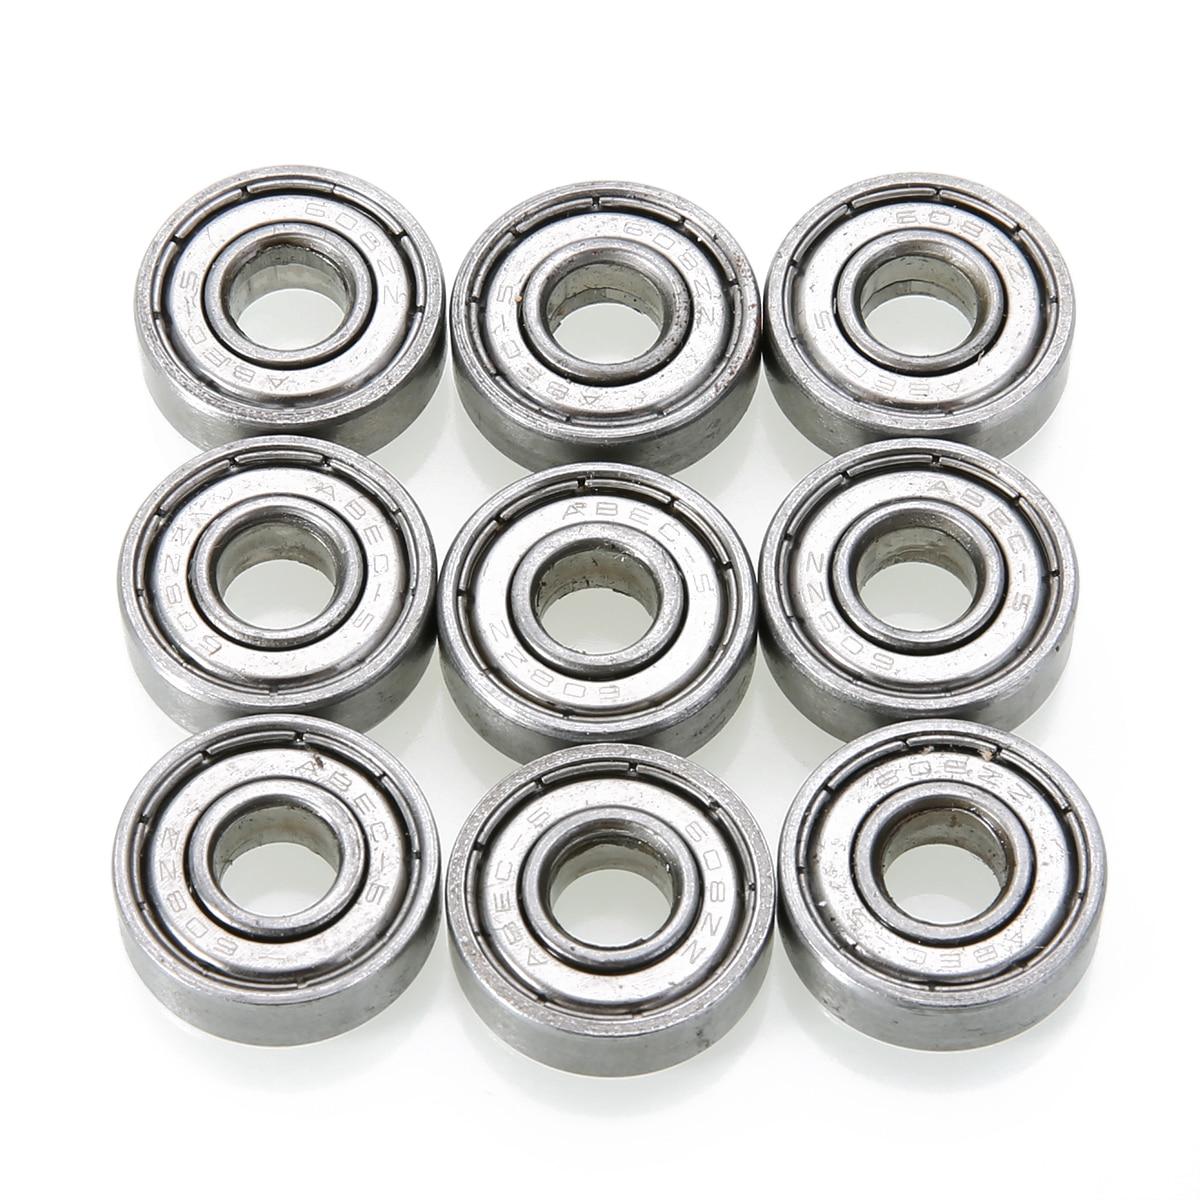 "10 pcs - 8mm 0.3150/"" Inch Chrome Steel Loose Bearing Balls Bearings Ball"